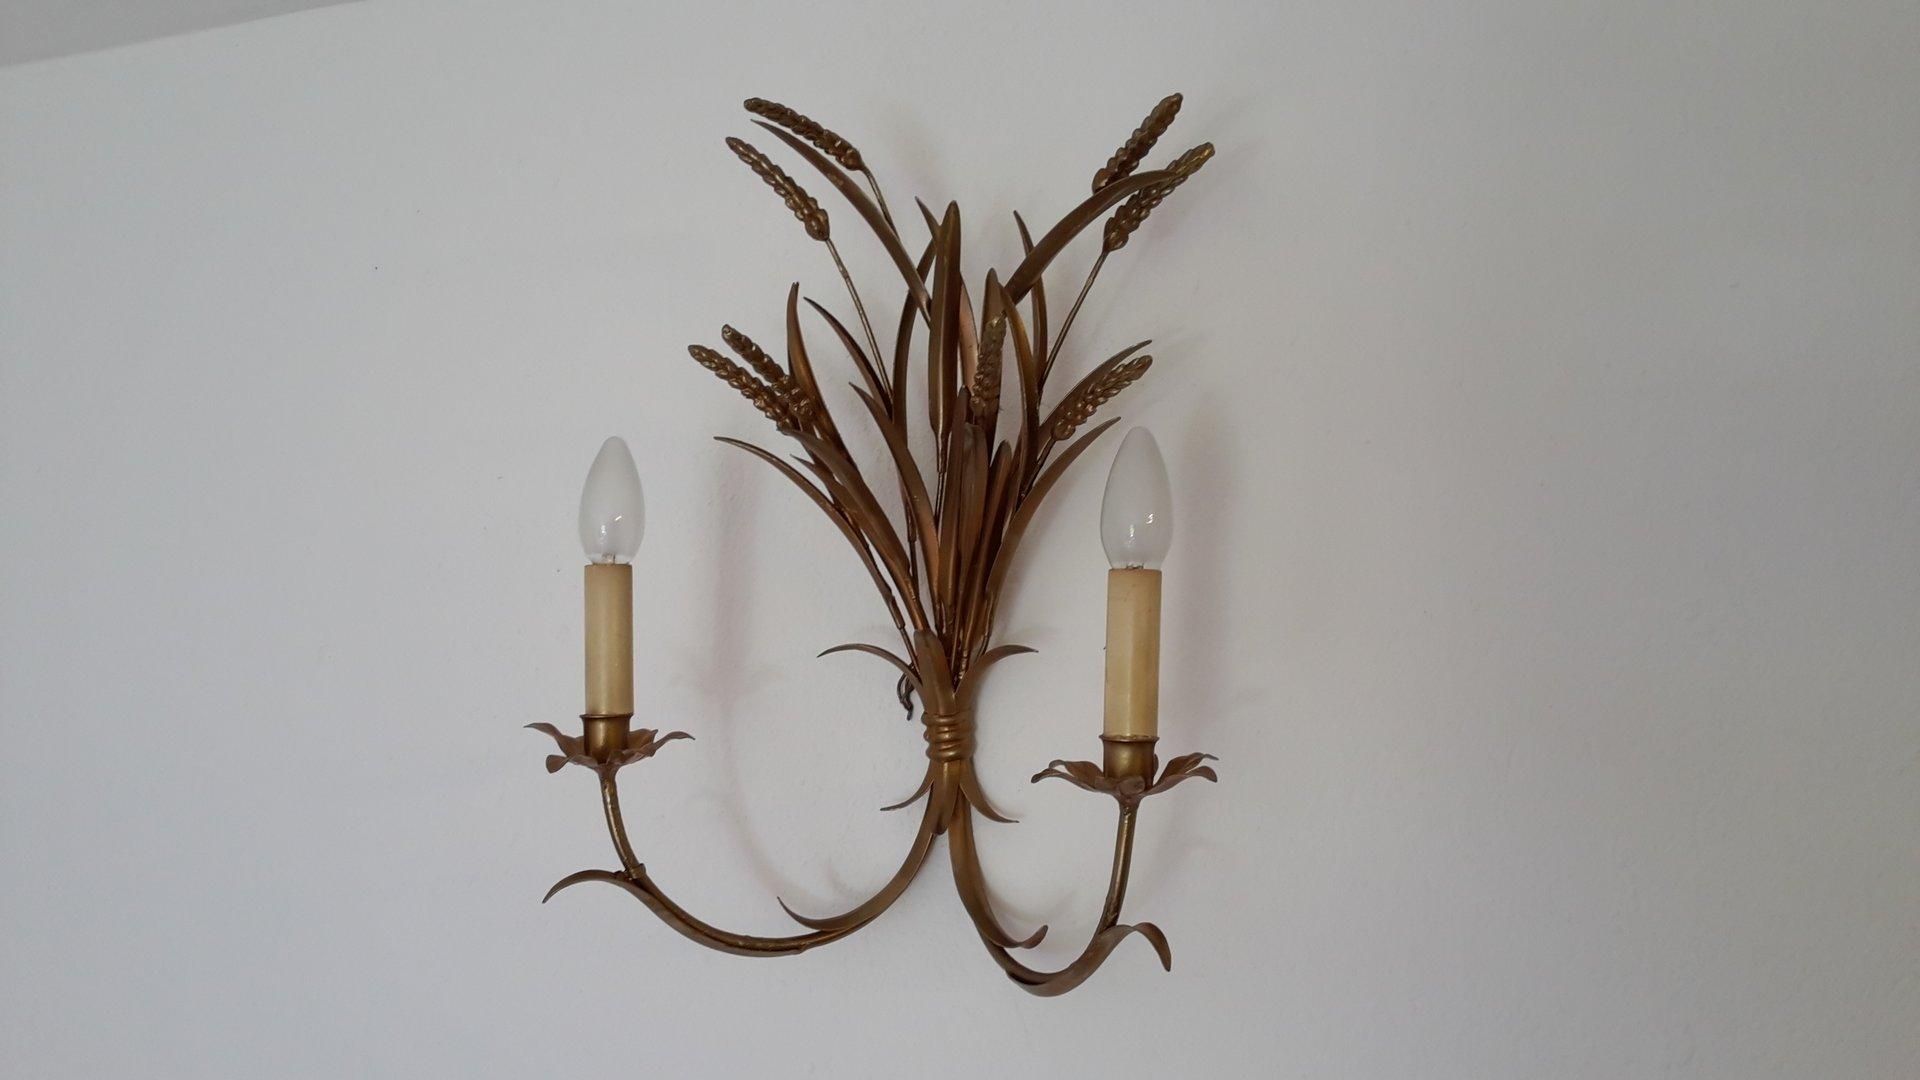 Italienische Vintage Messing Wandlampe, 1950er